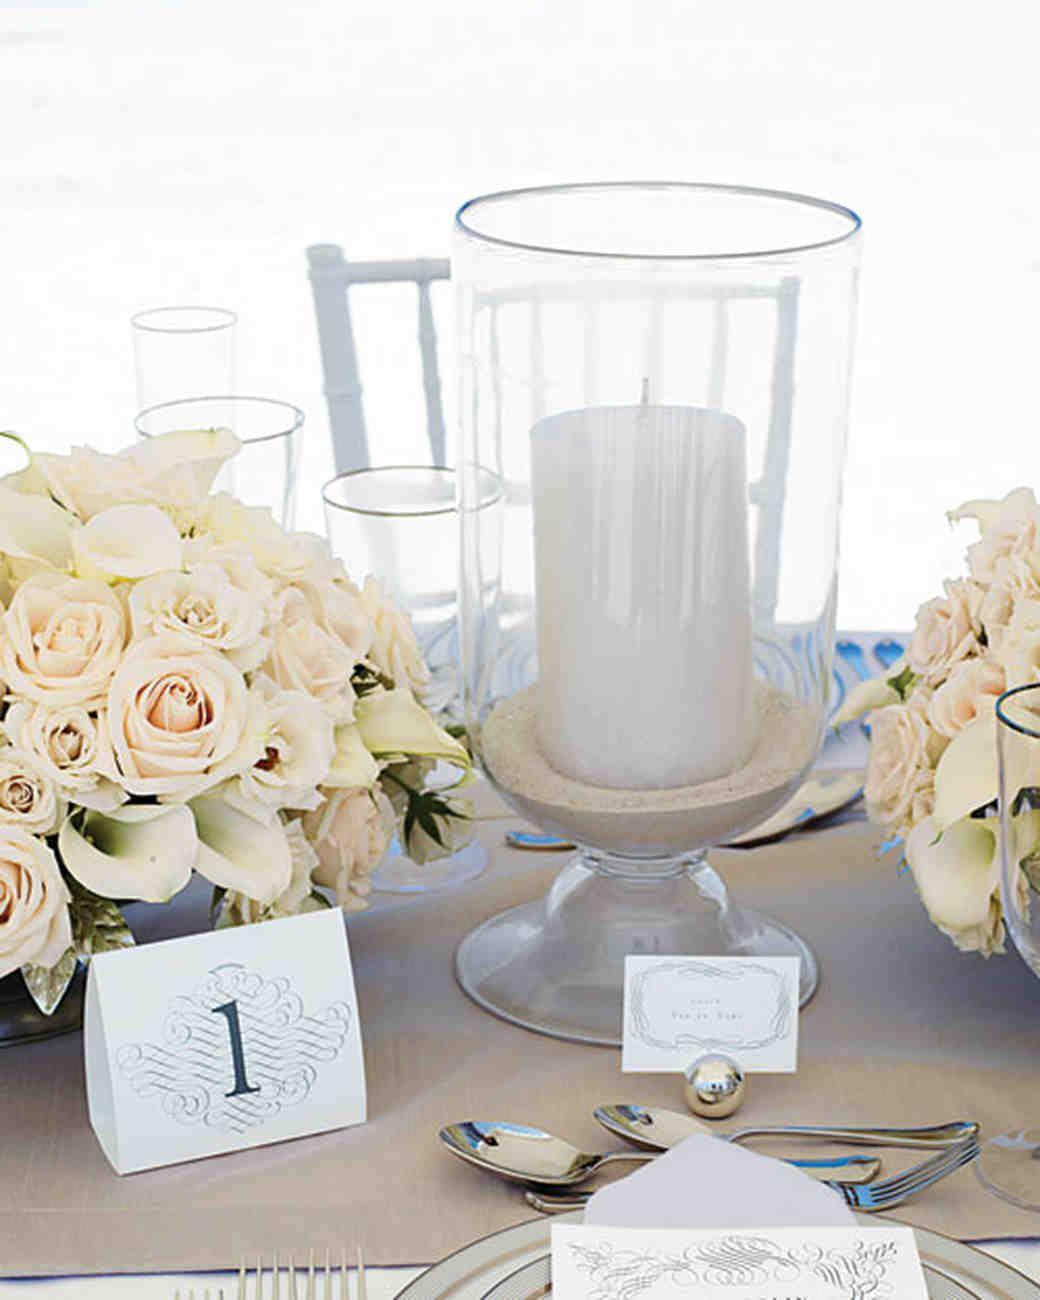 Beachy Centerpiece | Wedding Centerpieces | Pinterest | Beachy ...